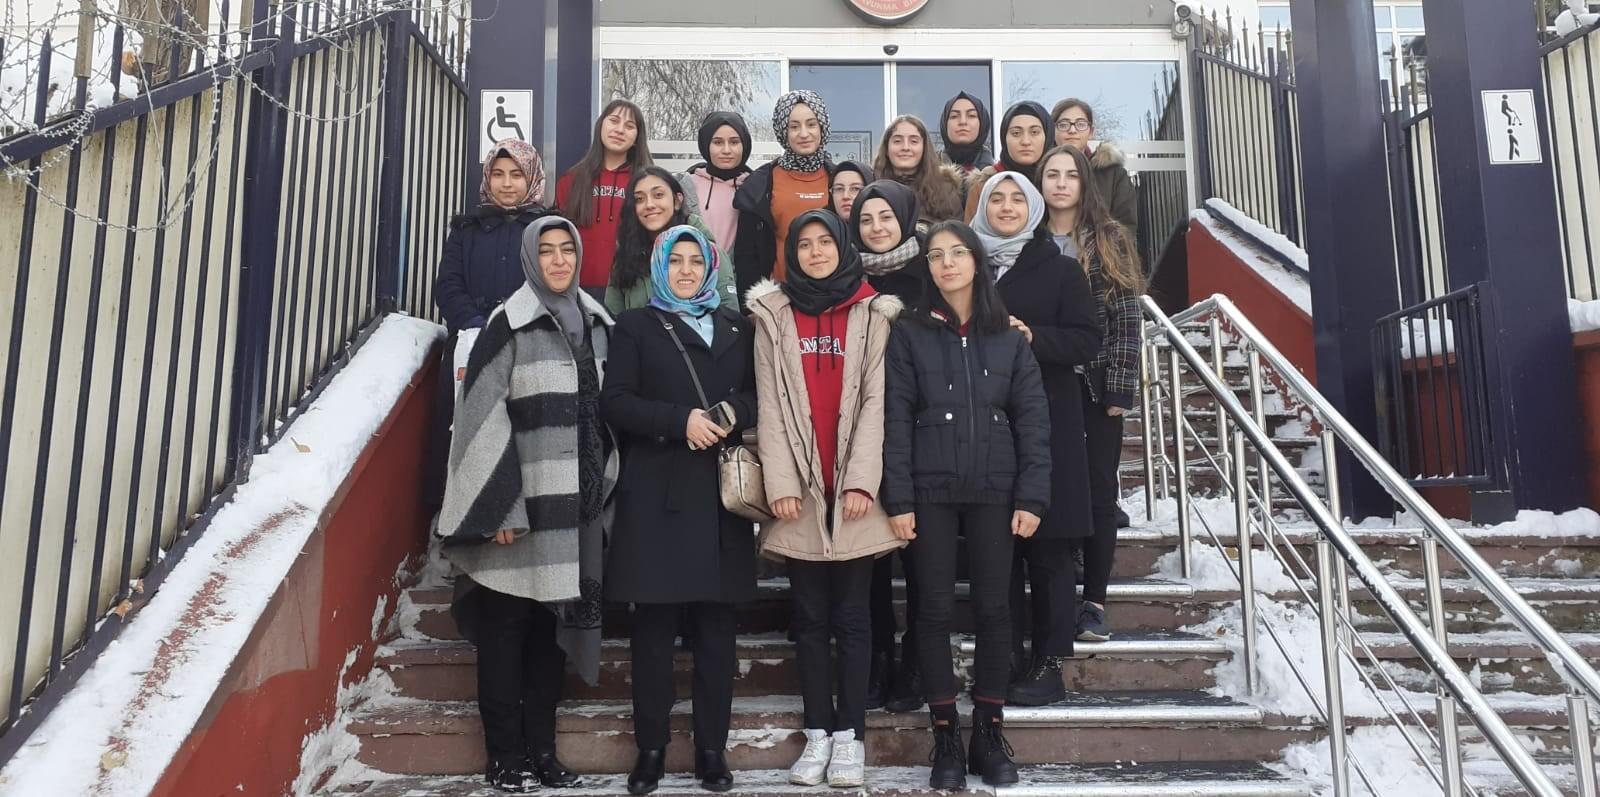 Öğrencilerden Mehmetçiğe mektup